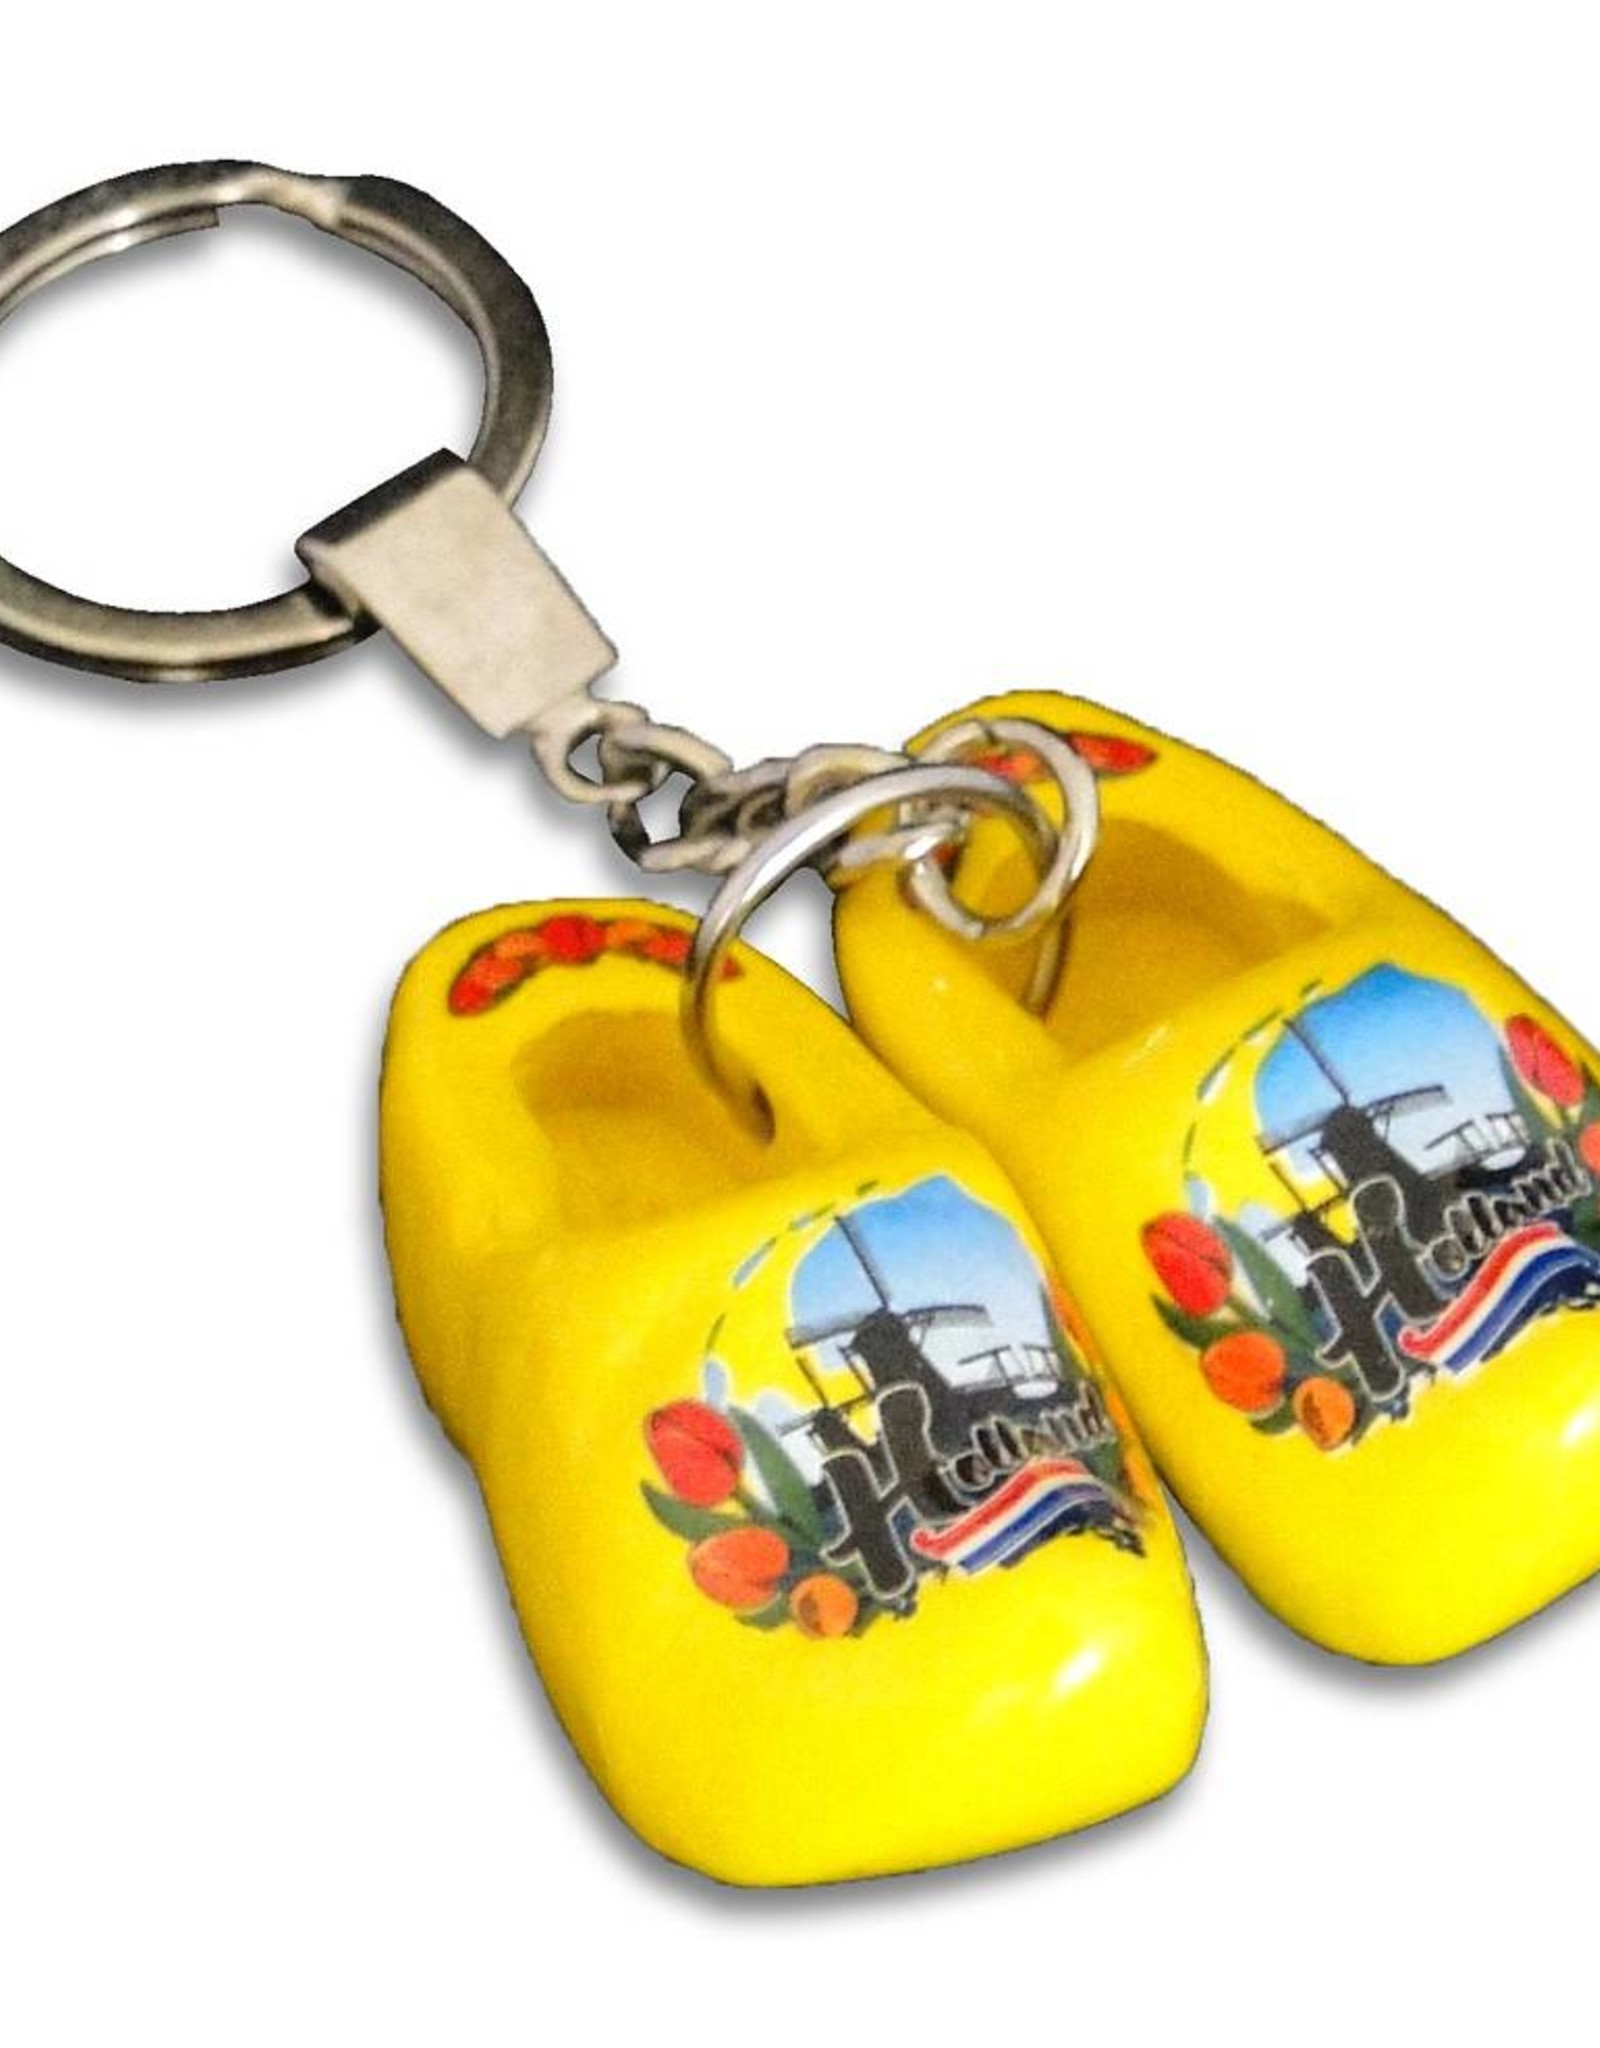 woodenshoe pair keyhanger Yellow with logo